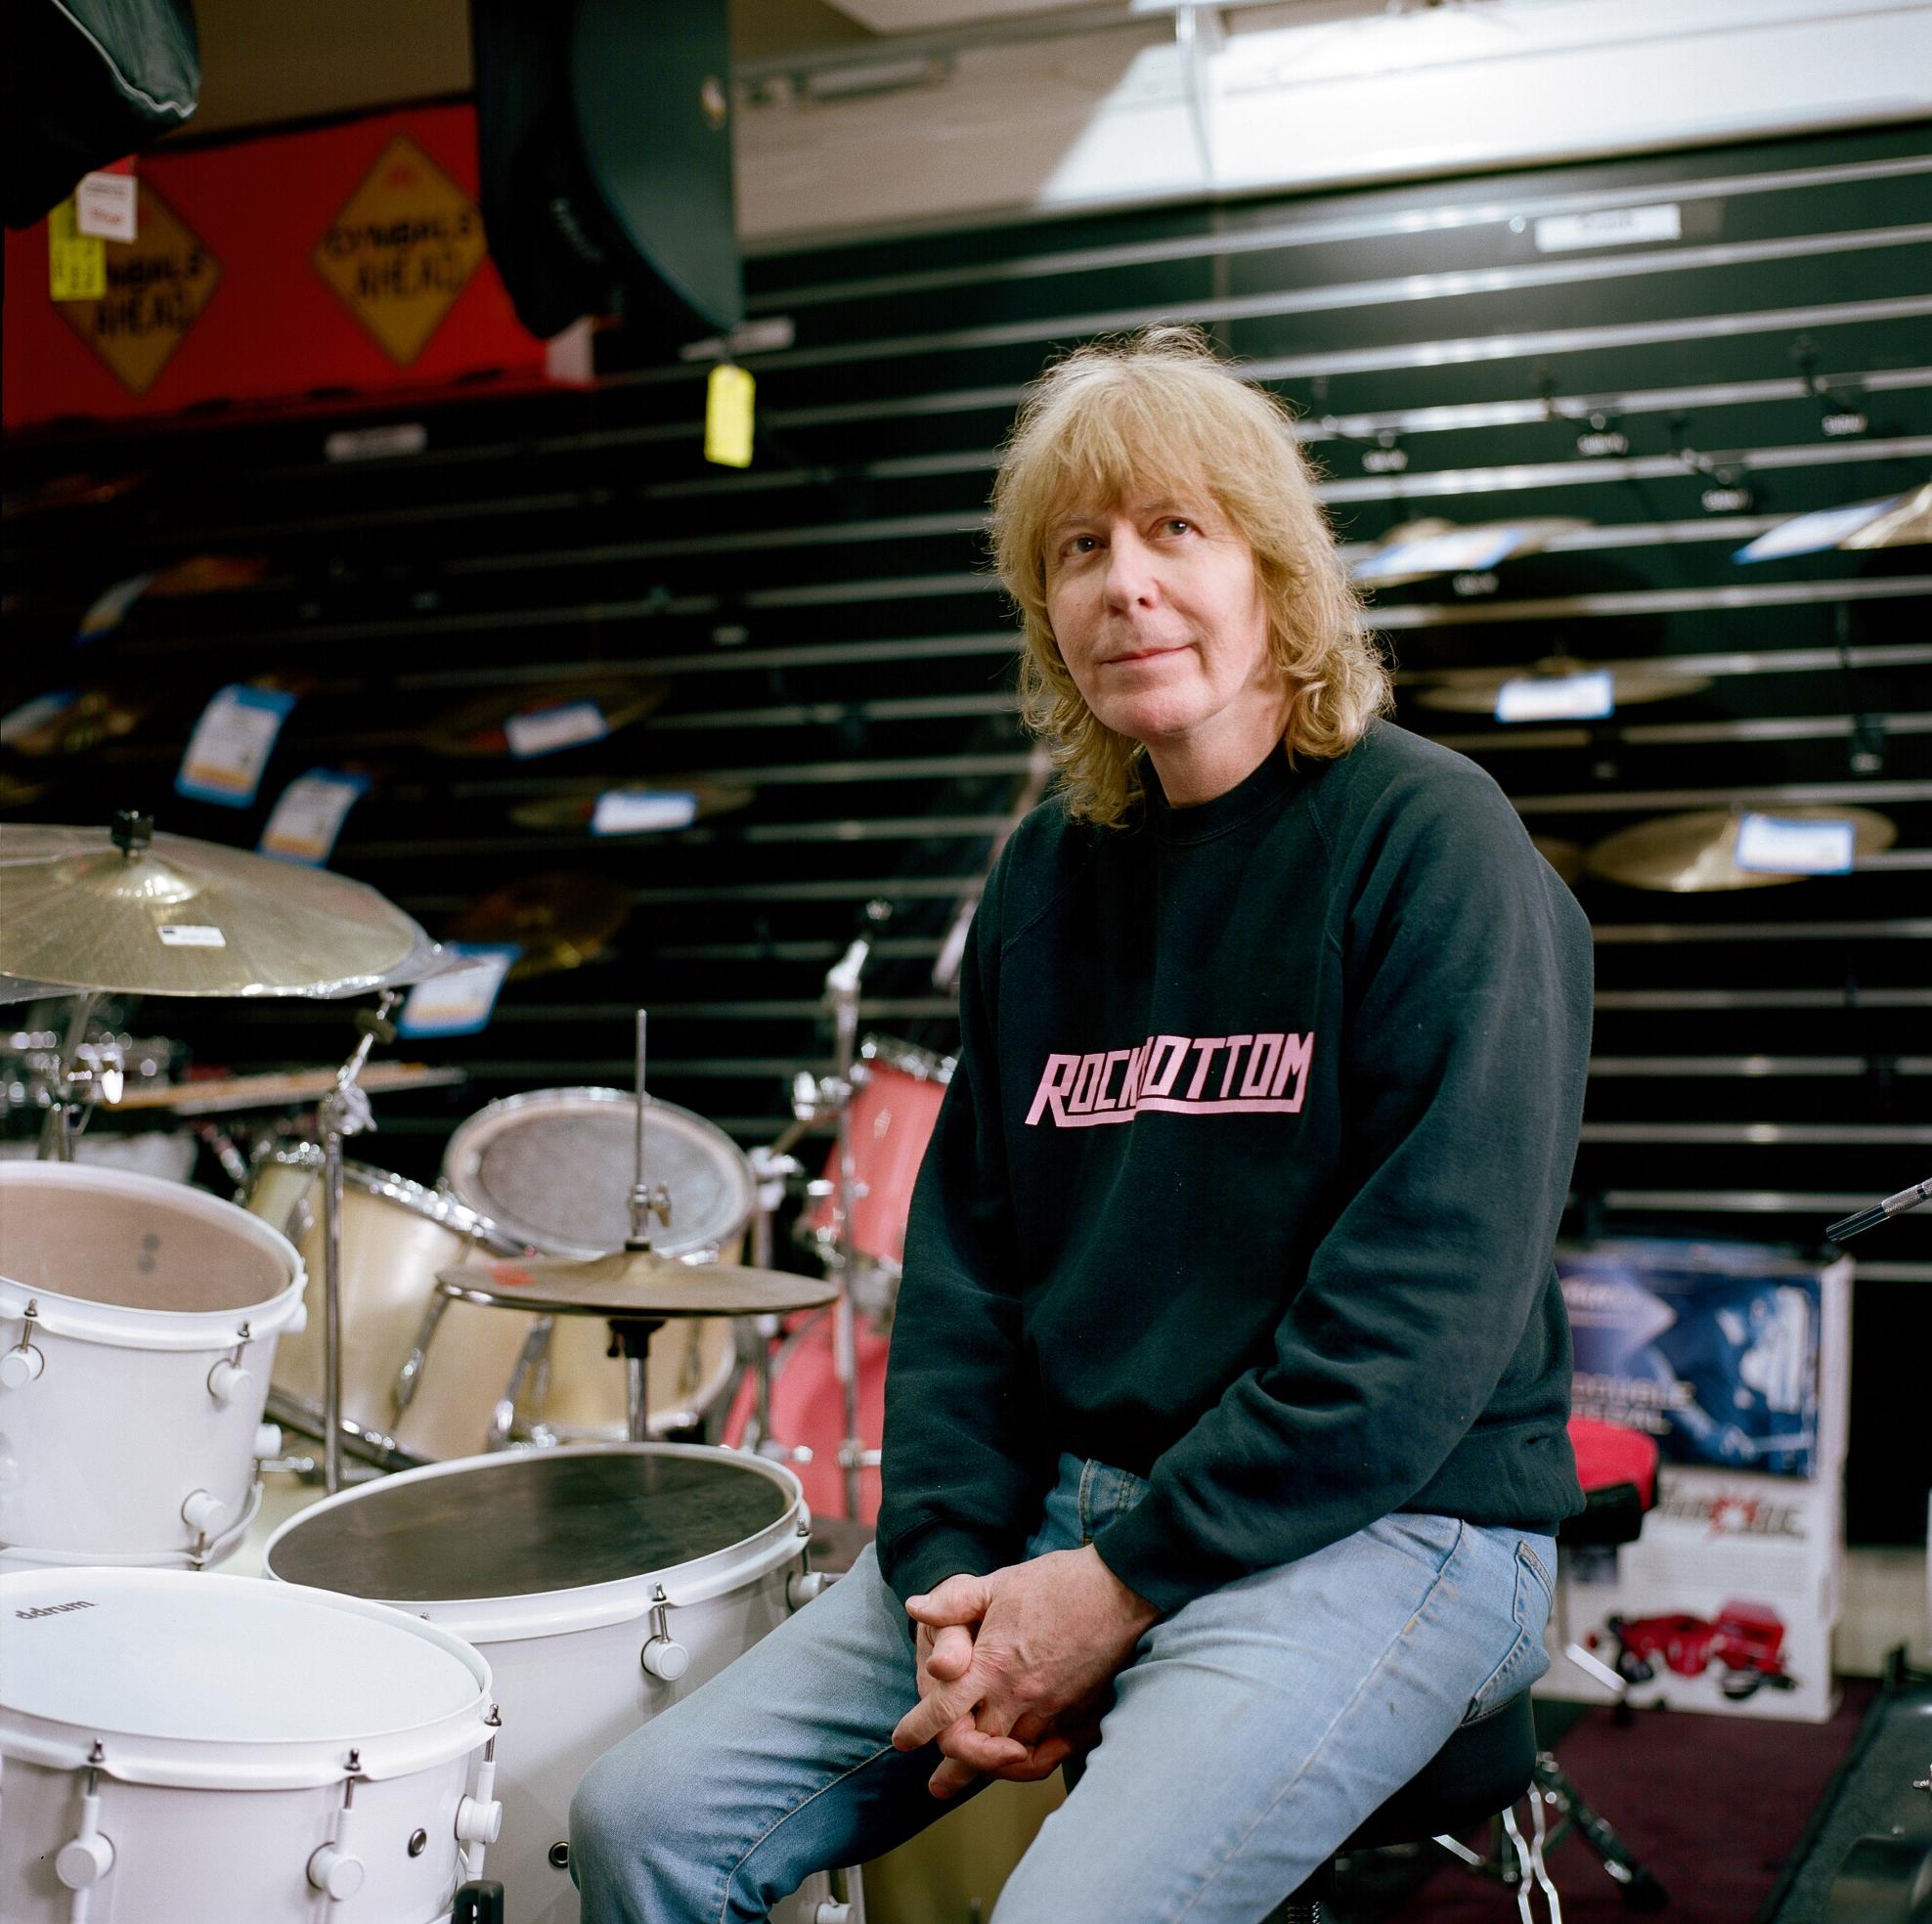 Carl, Rockbottom Music Owner